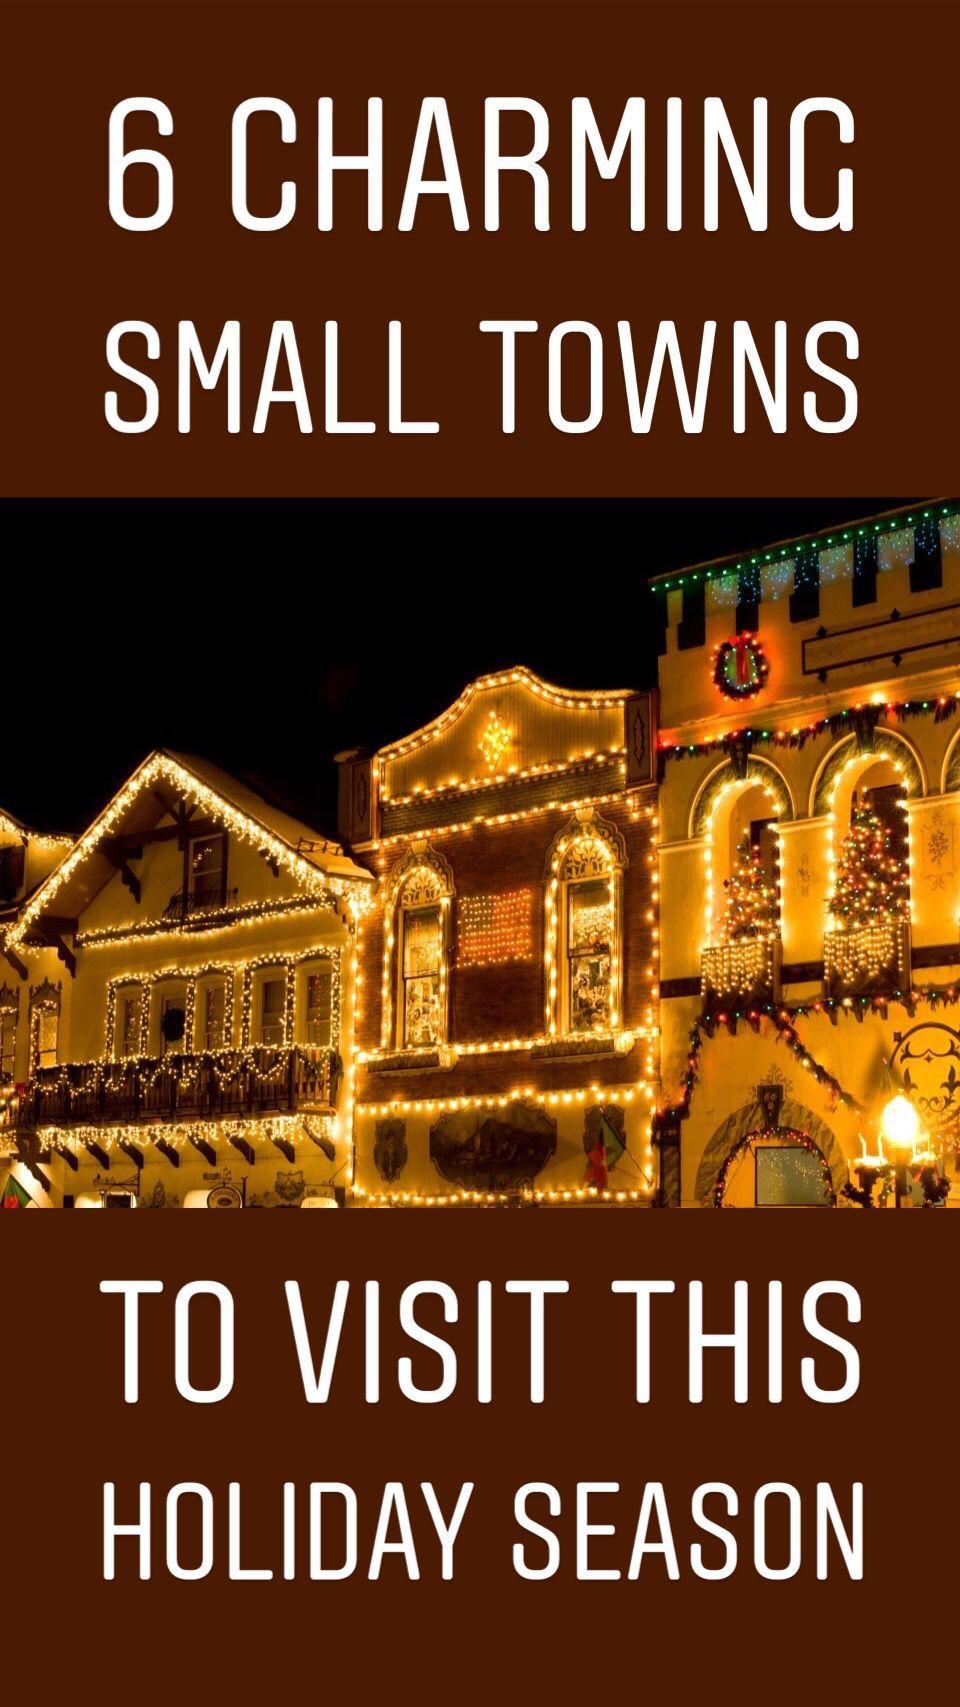 6 charming small towns to visit this holiday season